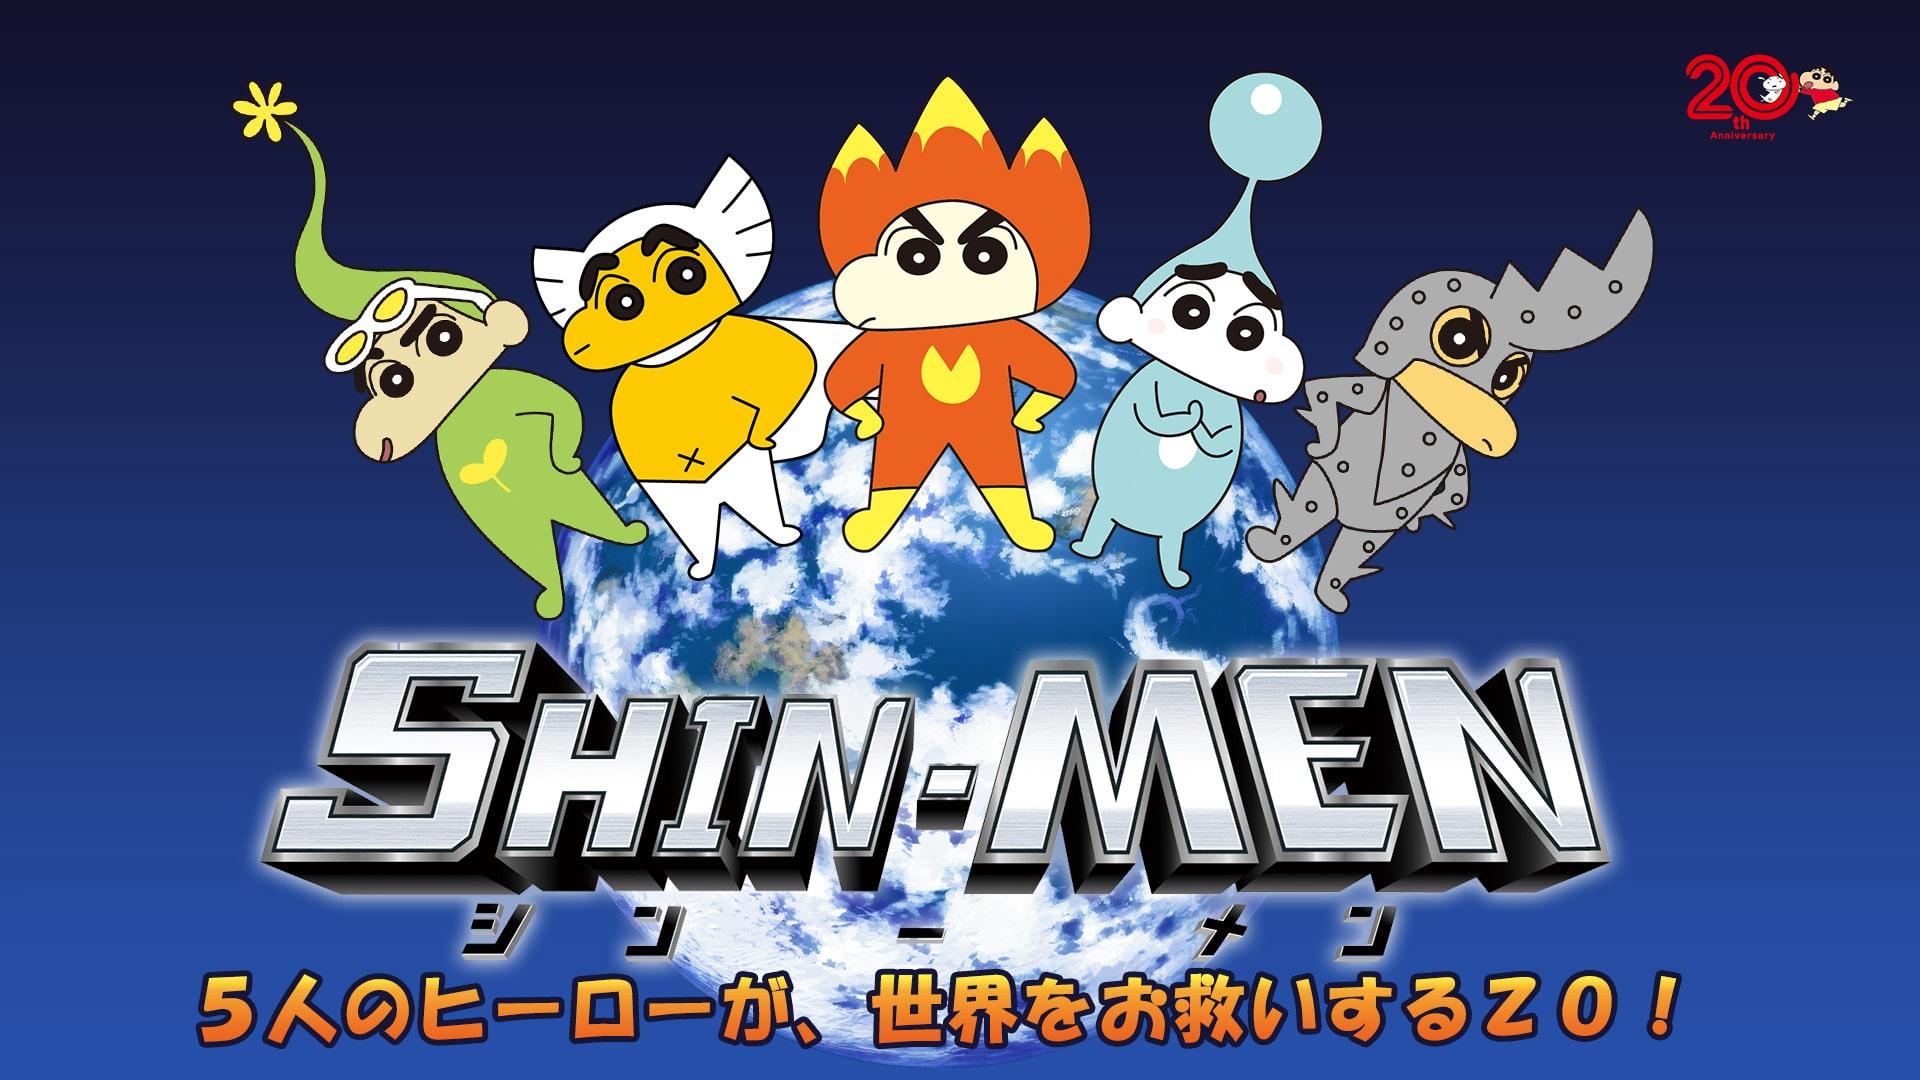 SHIN-MEN (シン-メン) In Japanese English Subbed